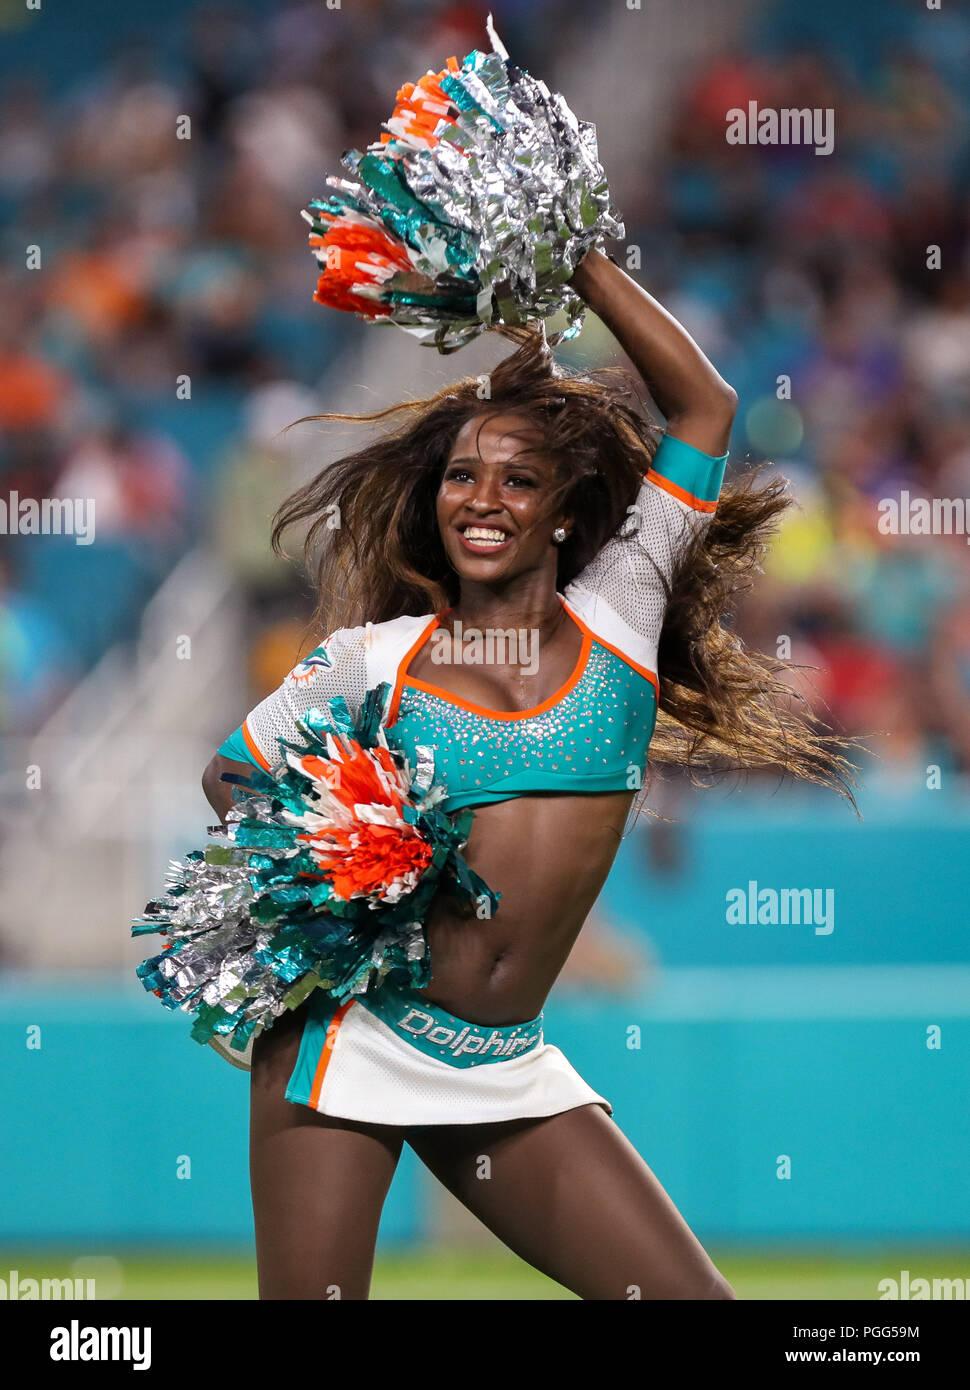 Dolphins Cheerleader Stock Photos & Dolphins Cheerleader Stock ...